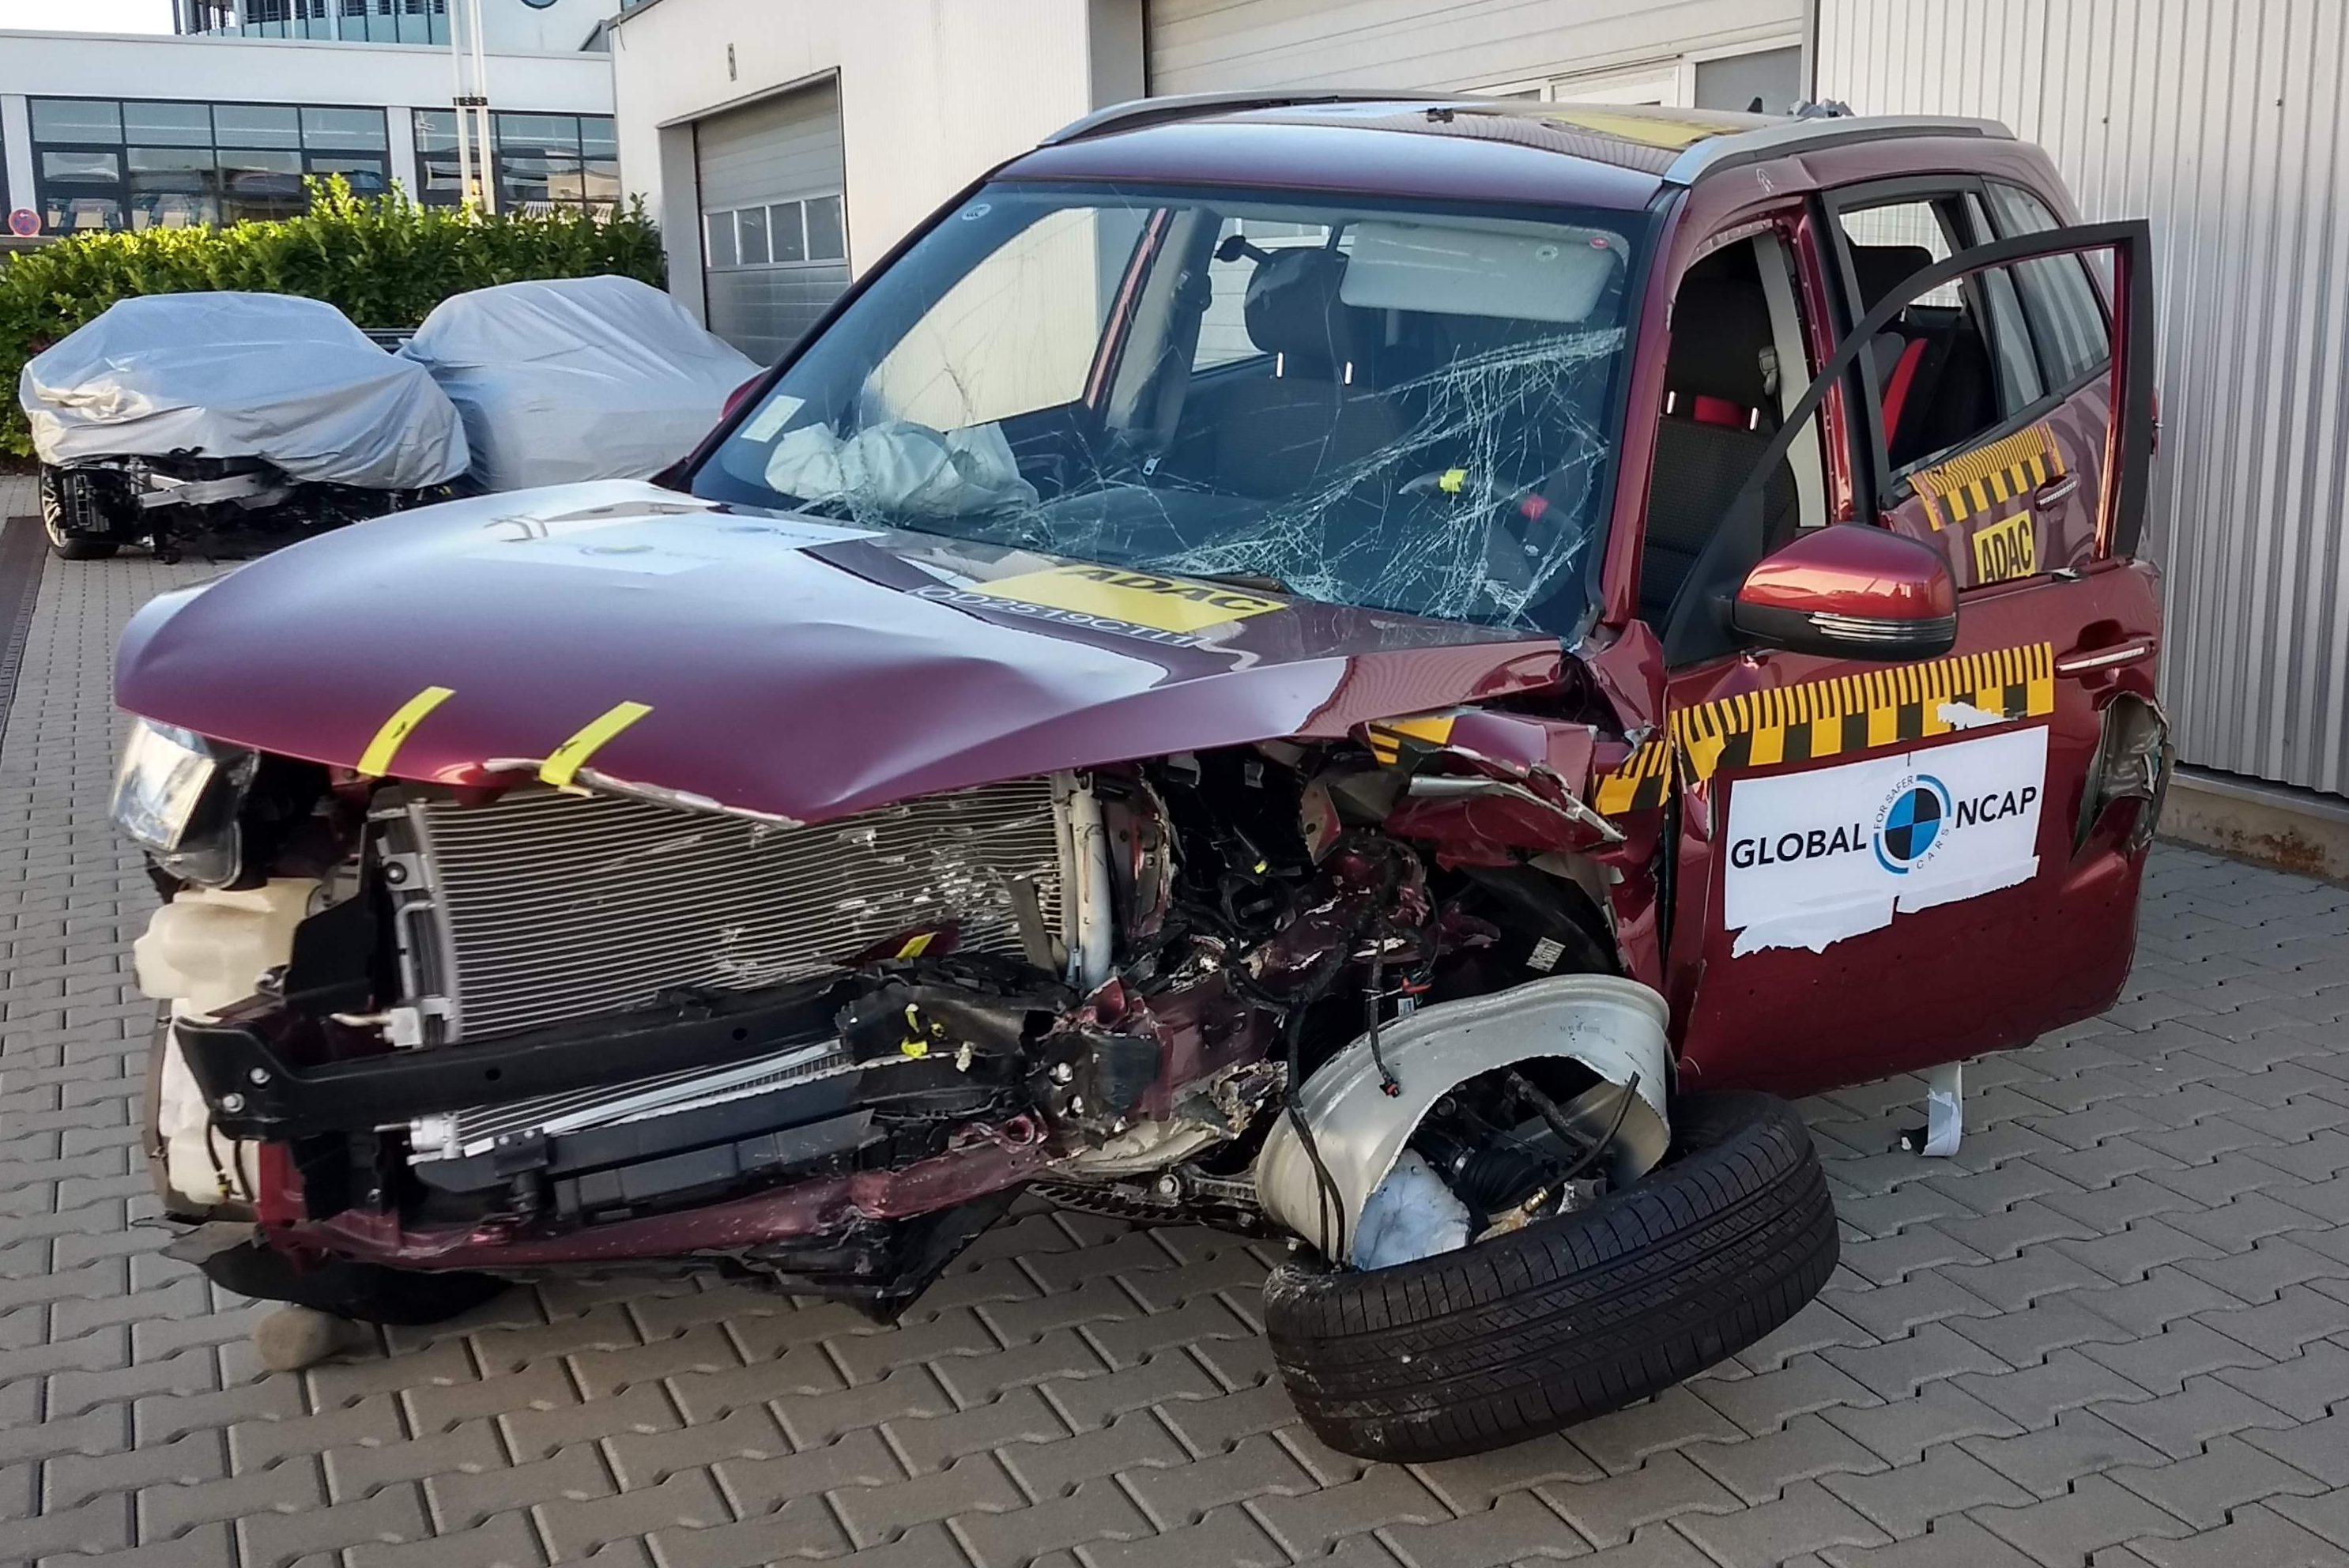 Onix, Palio, Ka: carros que já deram vexame nos 10 anos de Latin NCAP